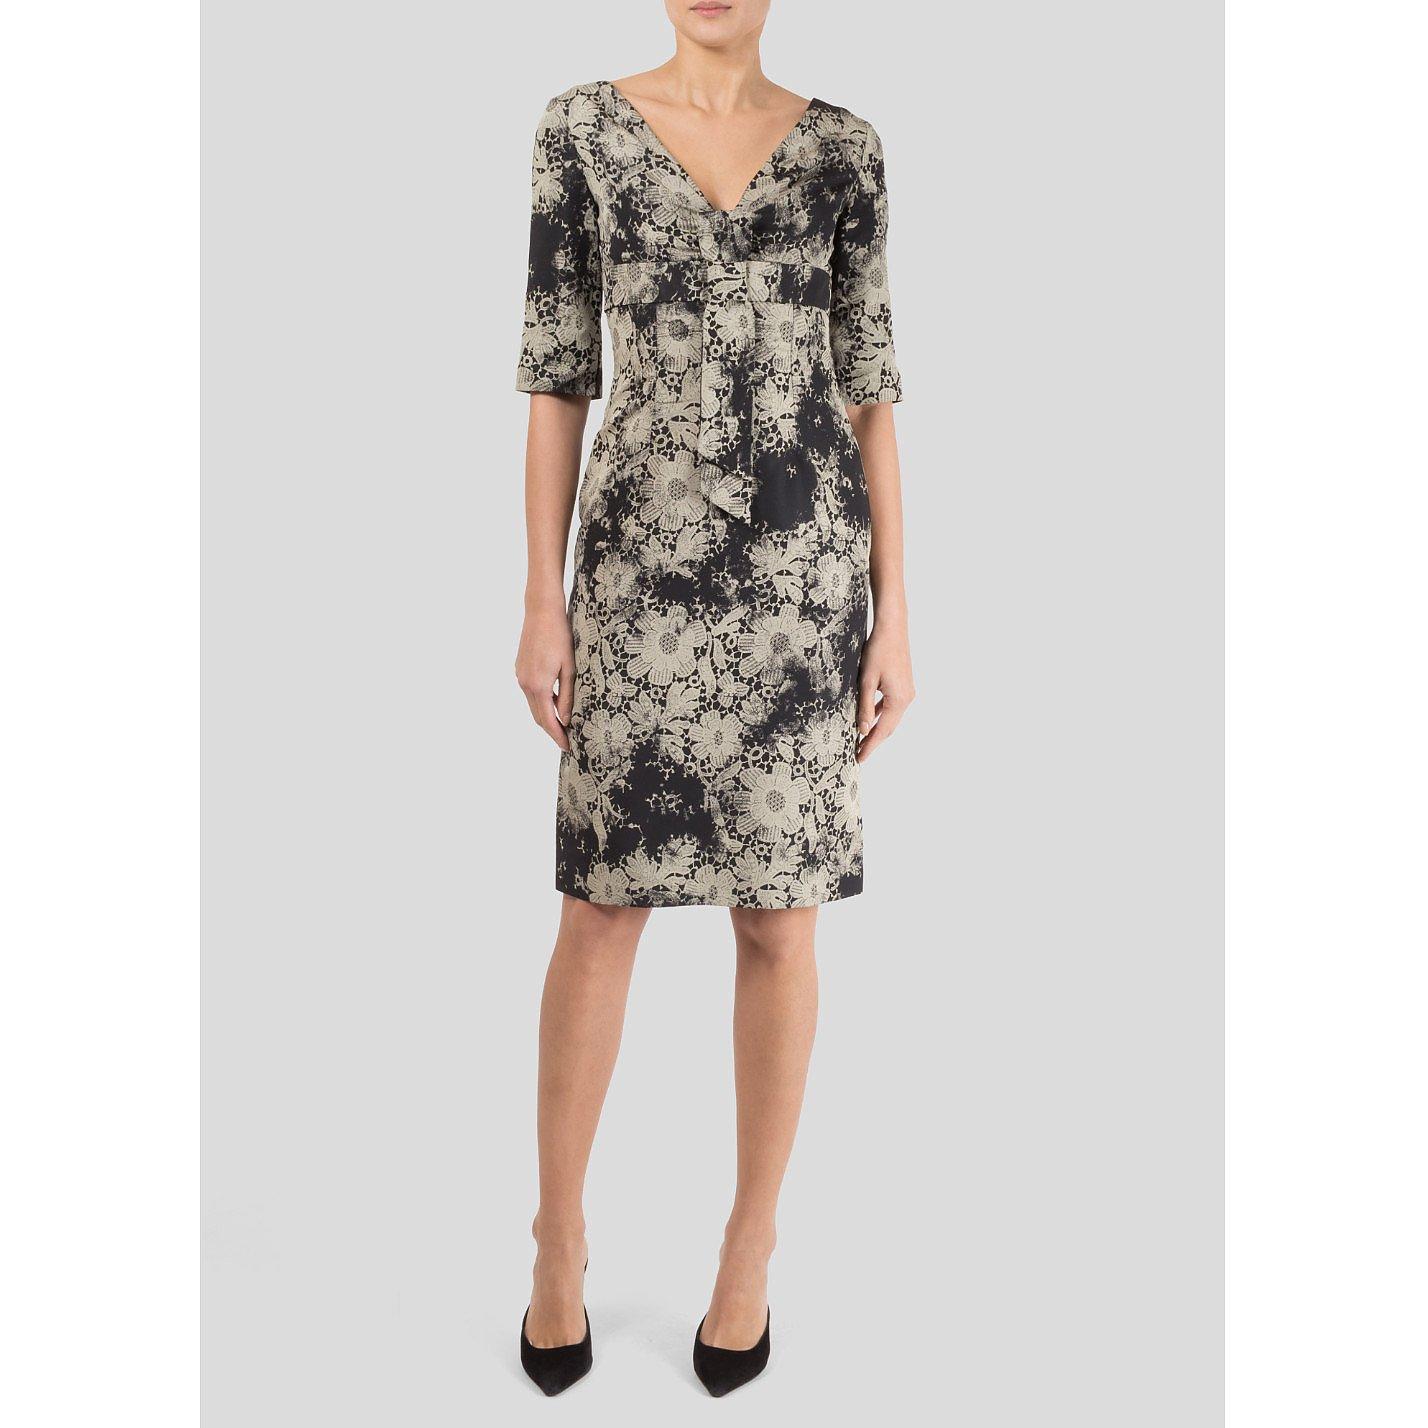 Alexander McQueen Floral Lace-Print Dress